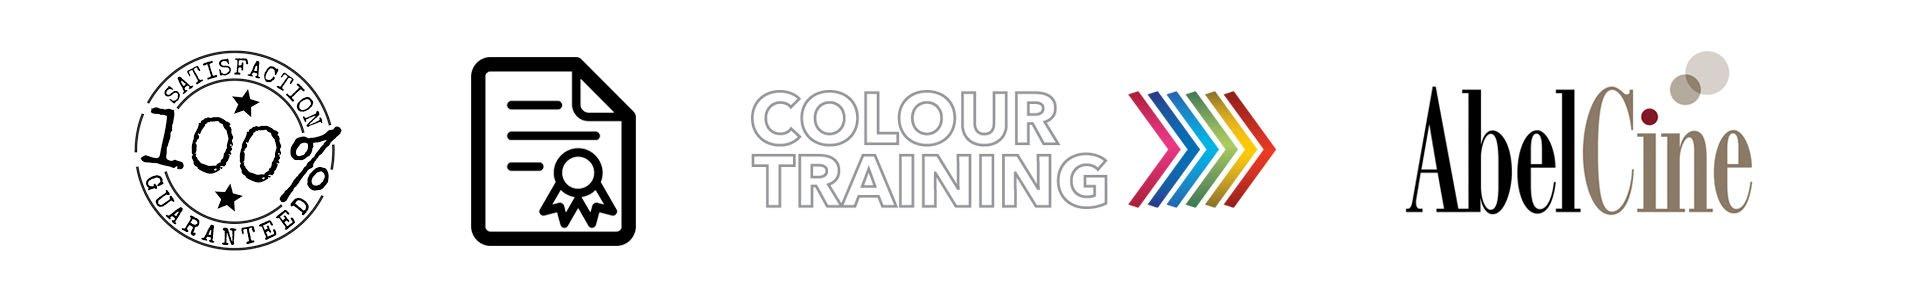 Davinci Resolve 16 Color Grading HDR Masterclass